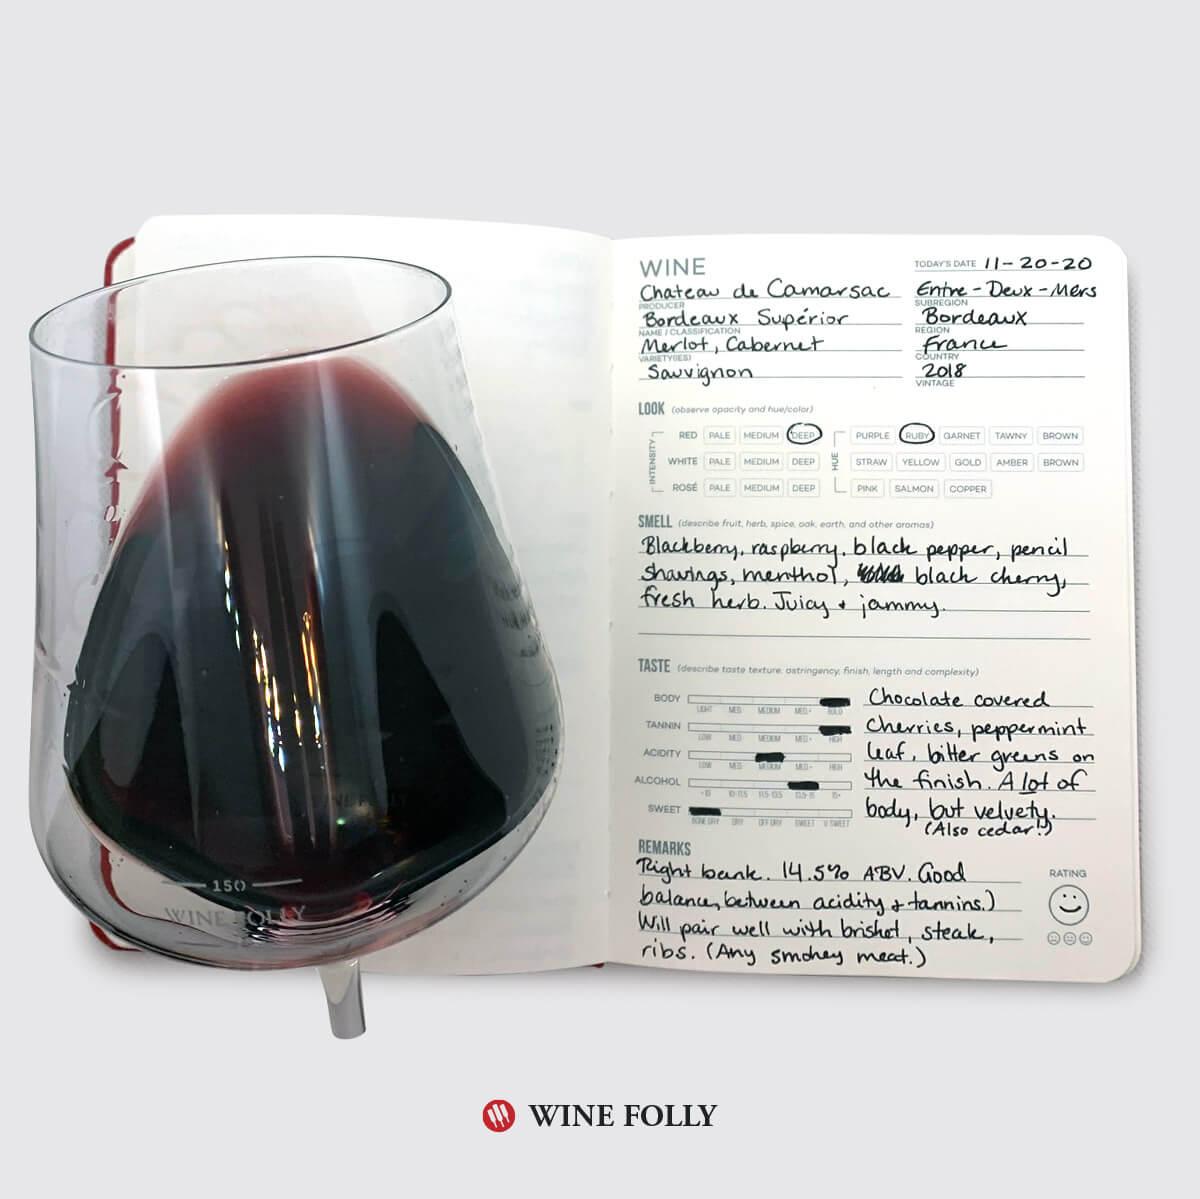 wine-tasting-challenge-bordeaux-winefolly